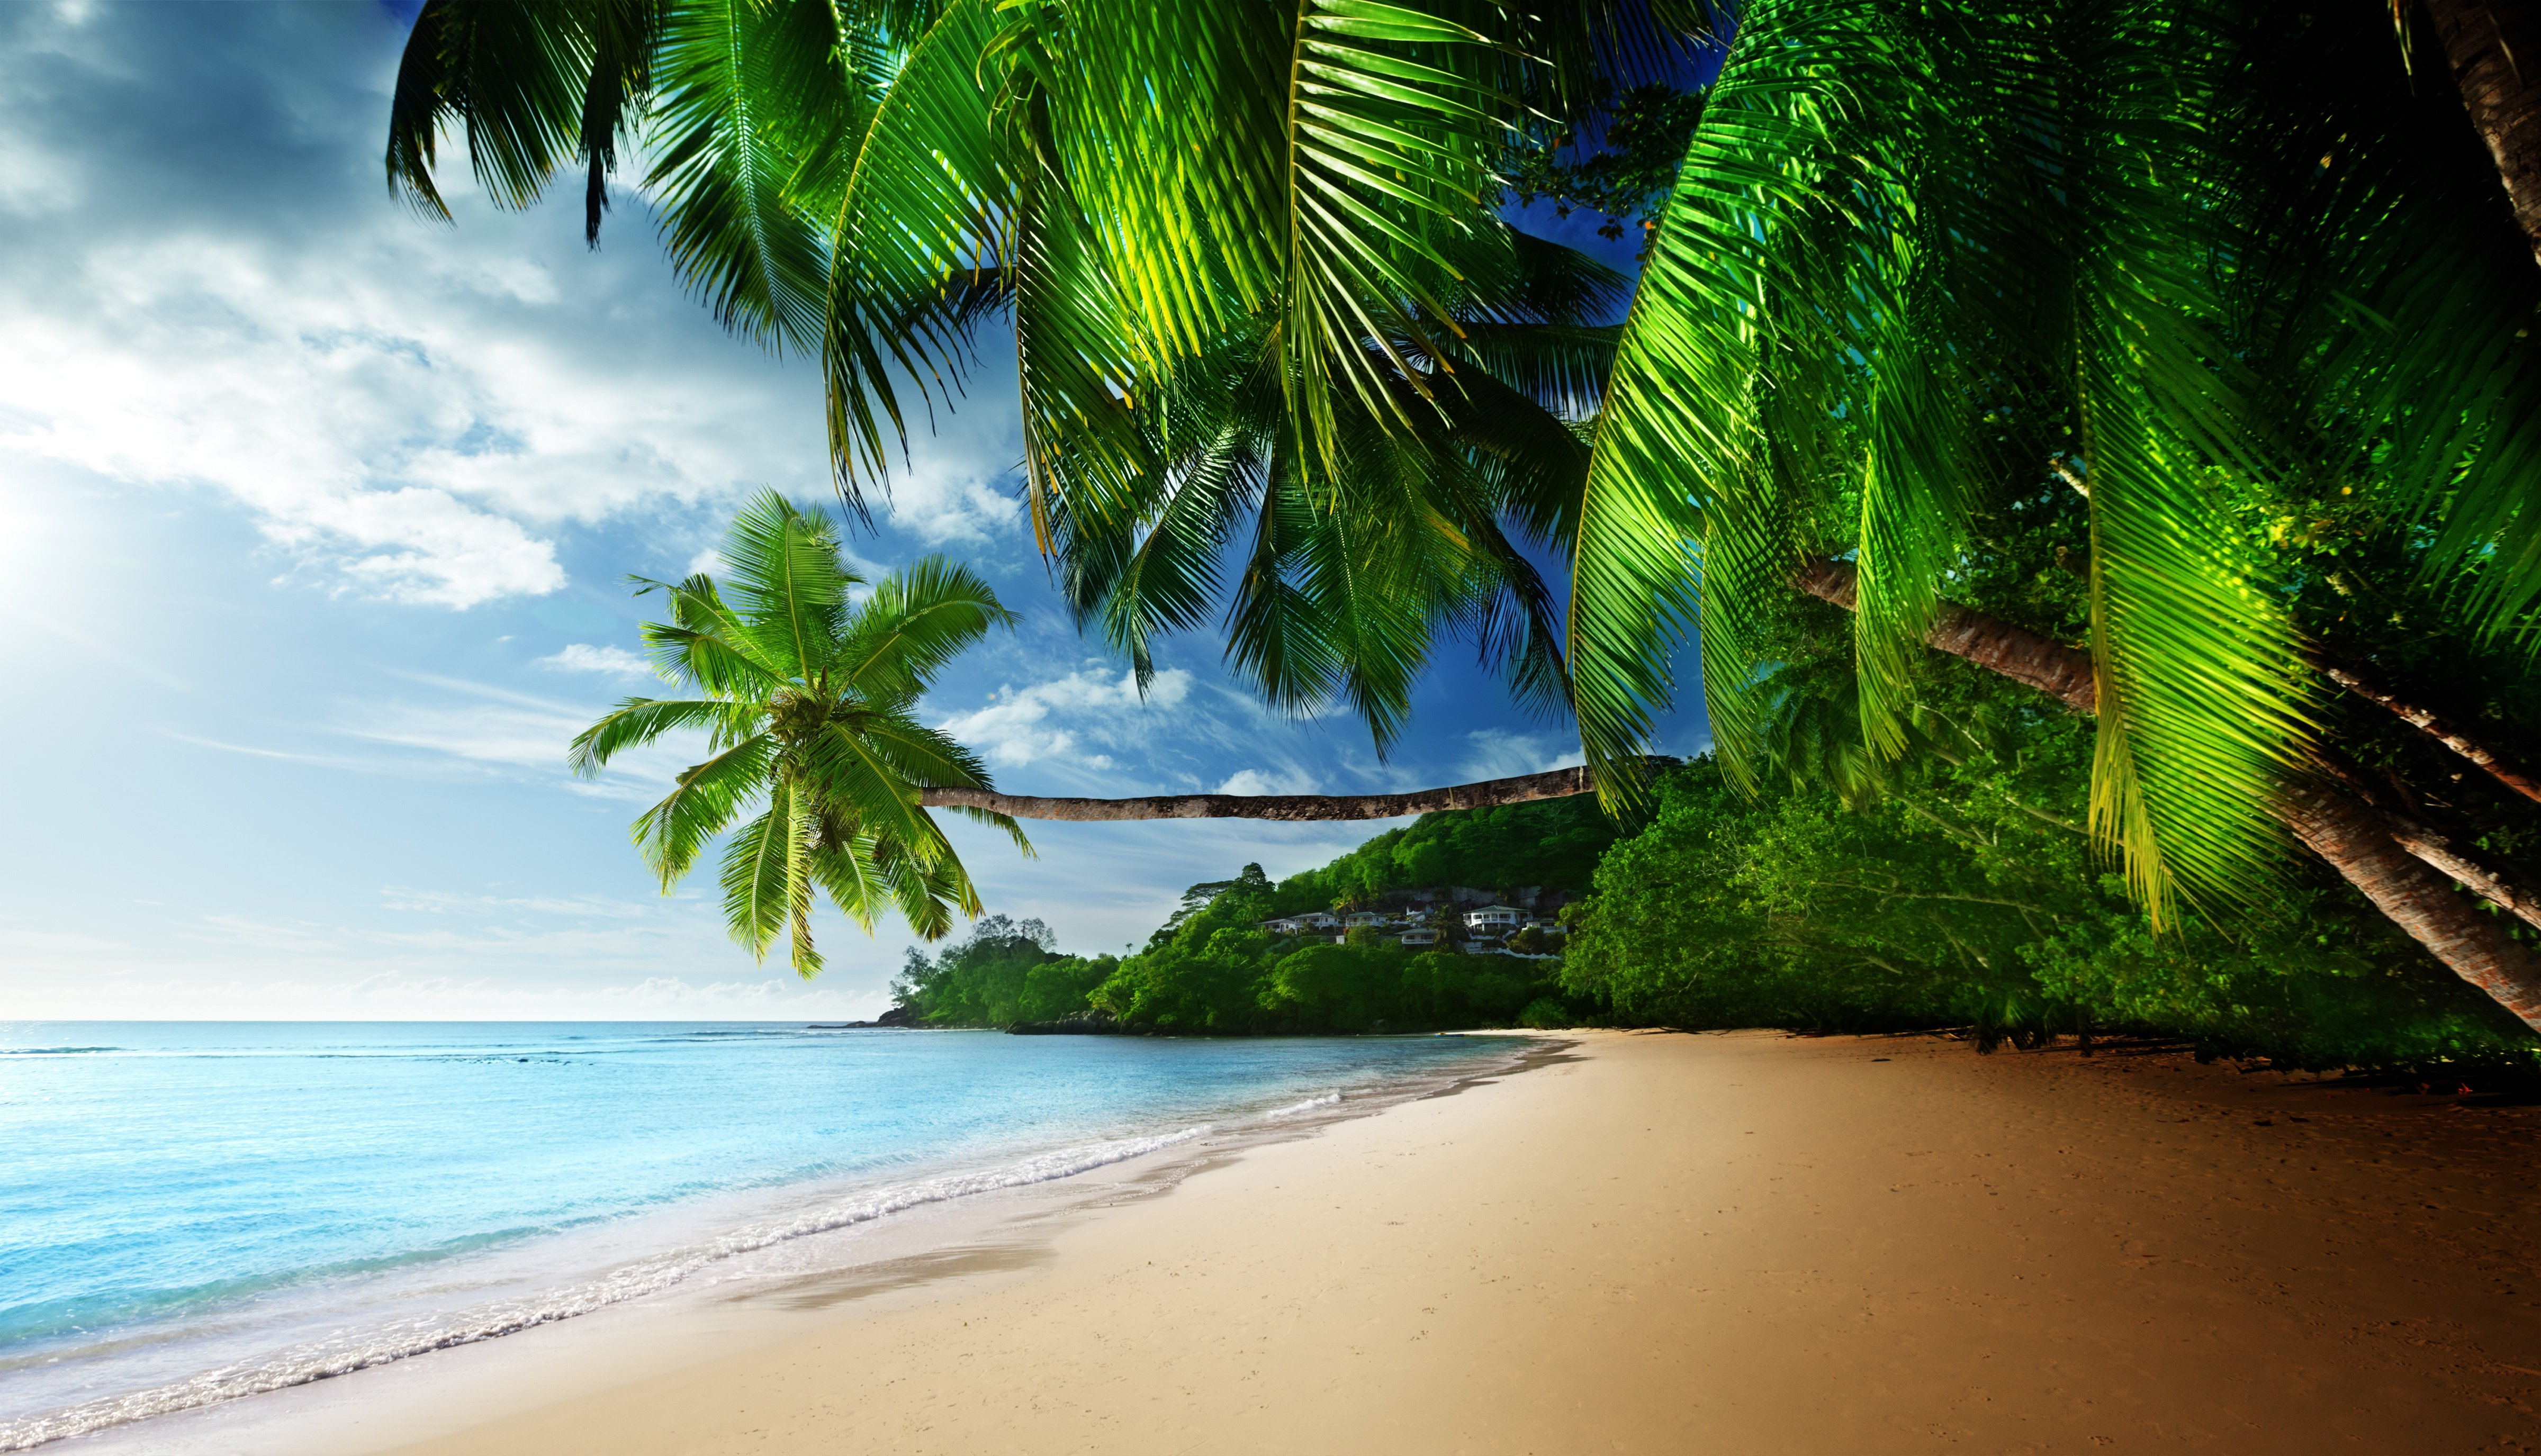 Hd Tropical Island Beach Paradise Wallpapers And Backgrounds: Paradise Beach Wallpaper